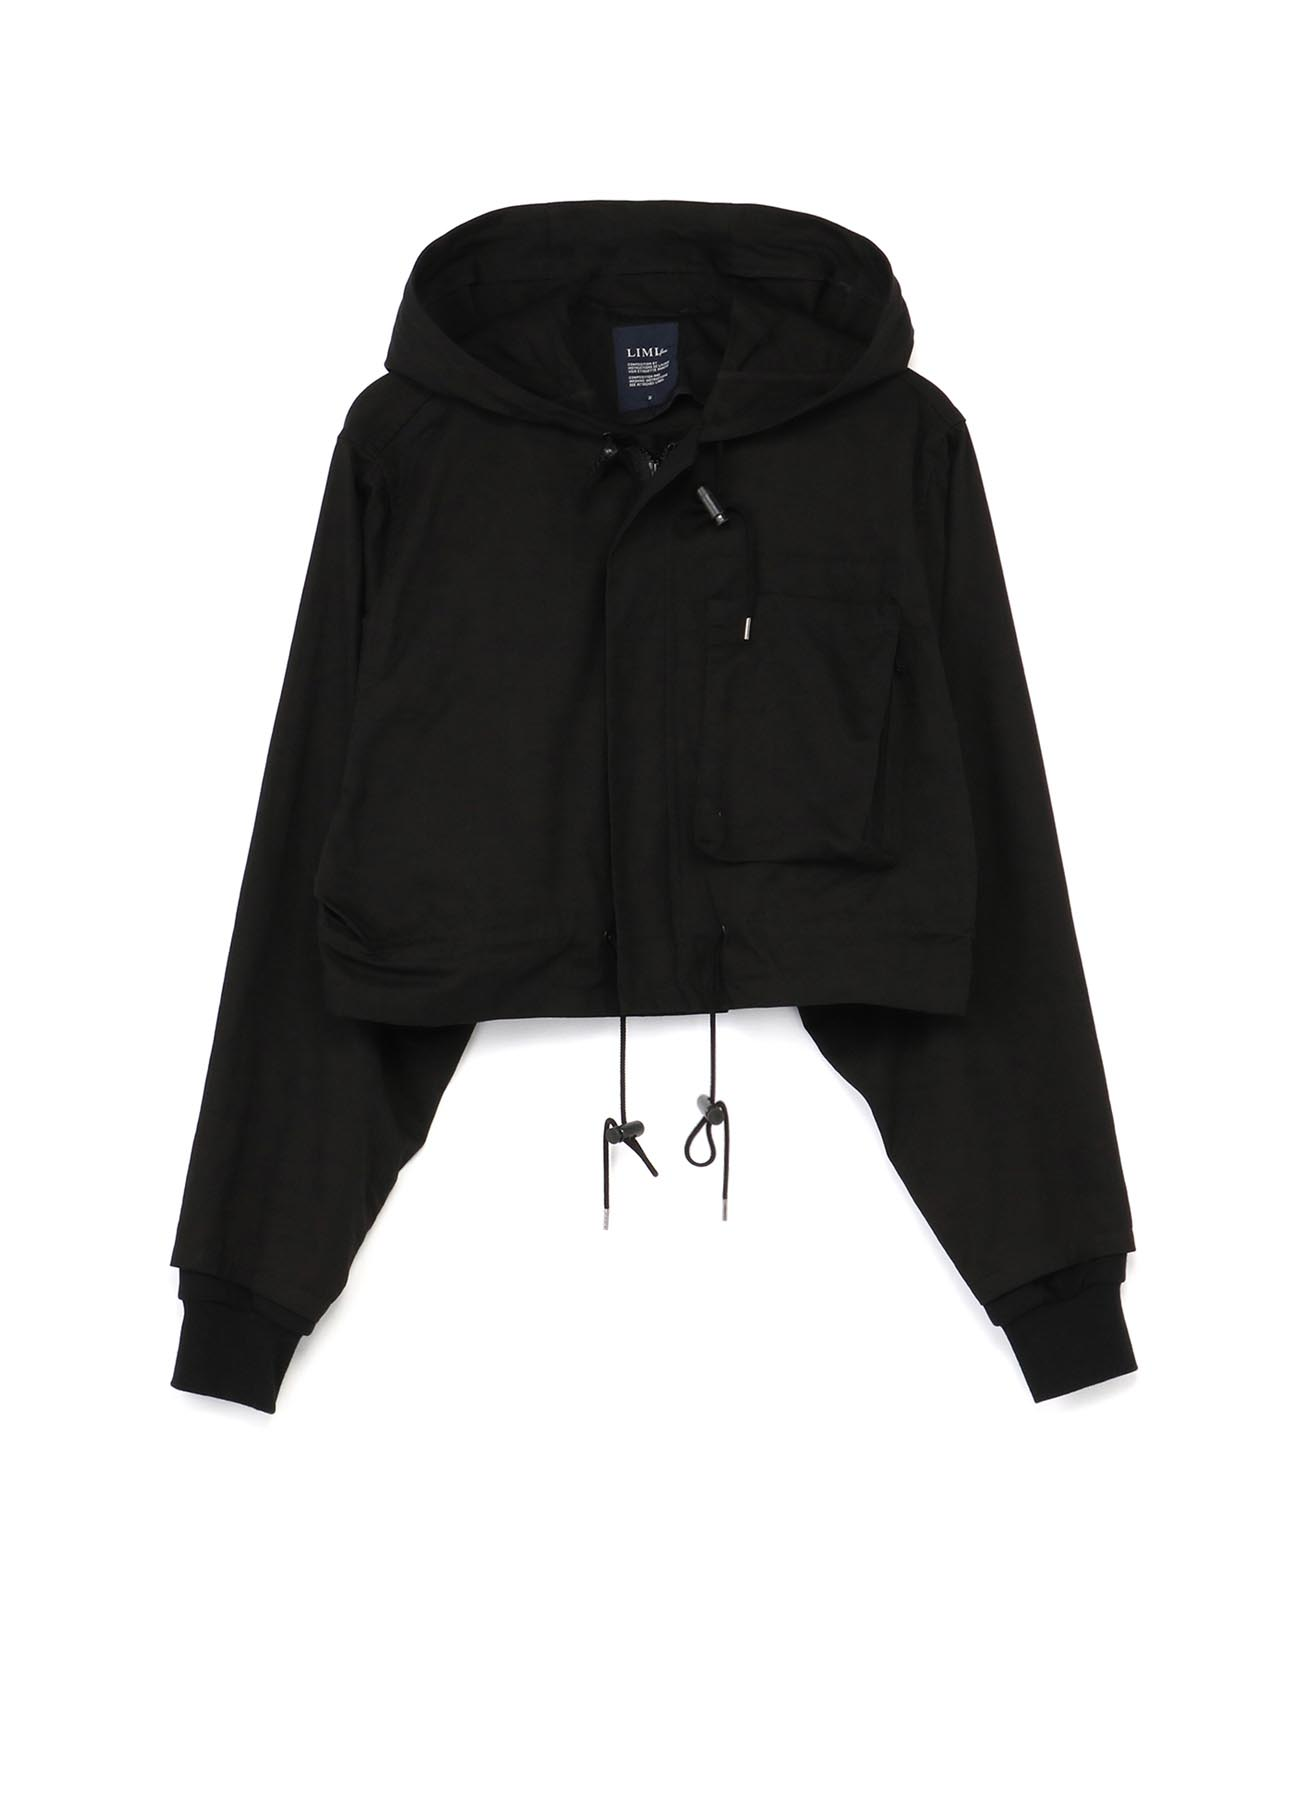 Soft Twill Outside Pocket Short Jacket